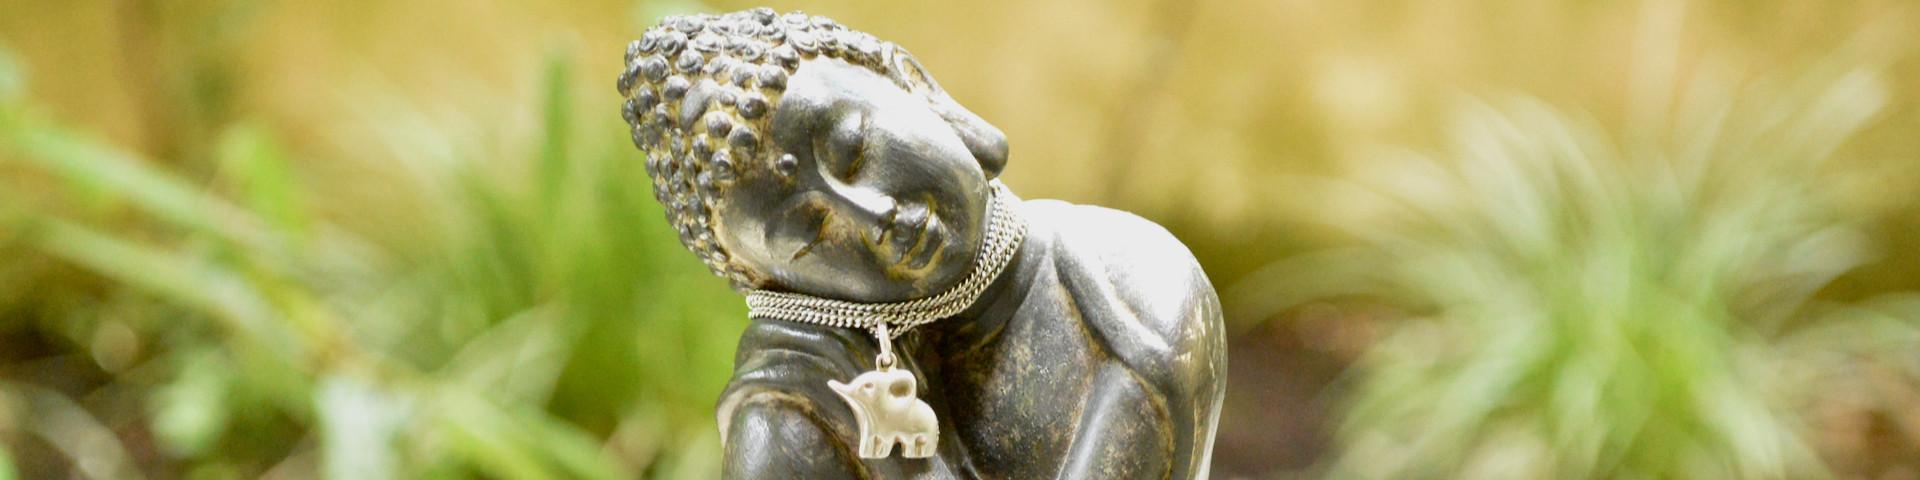 adorable elephant accessories